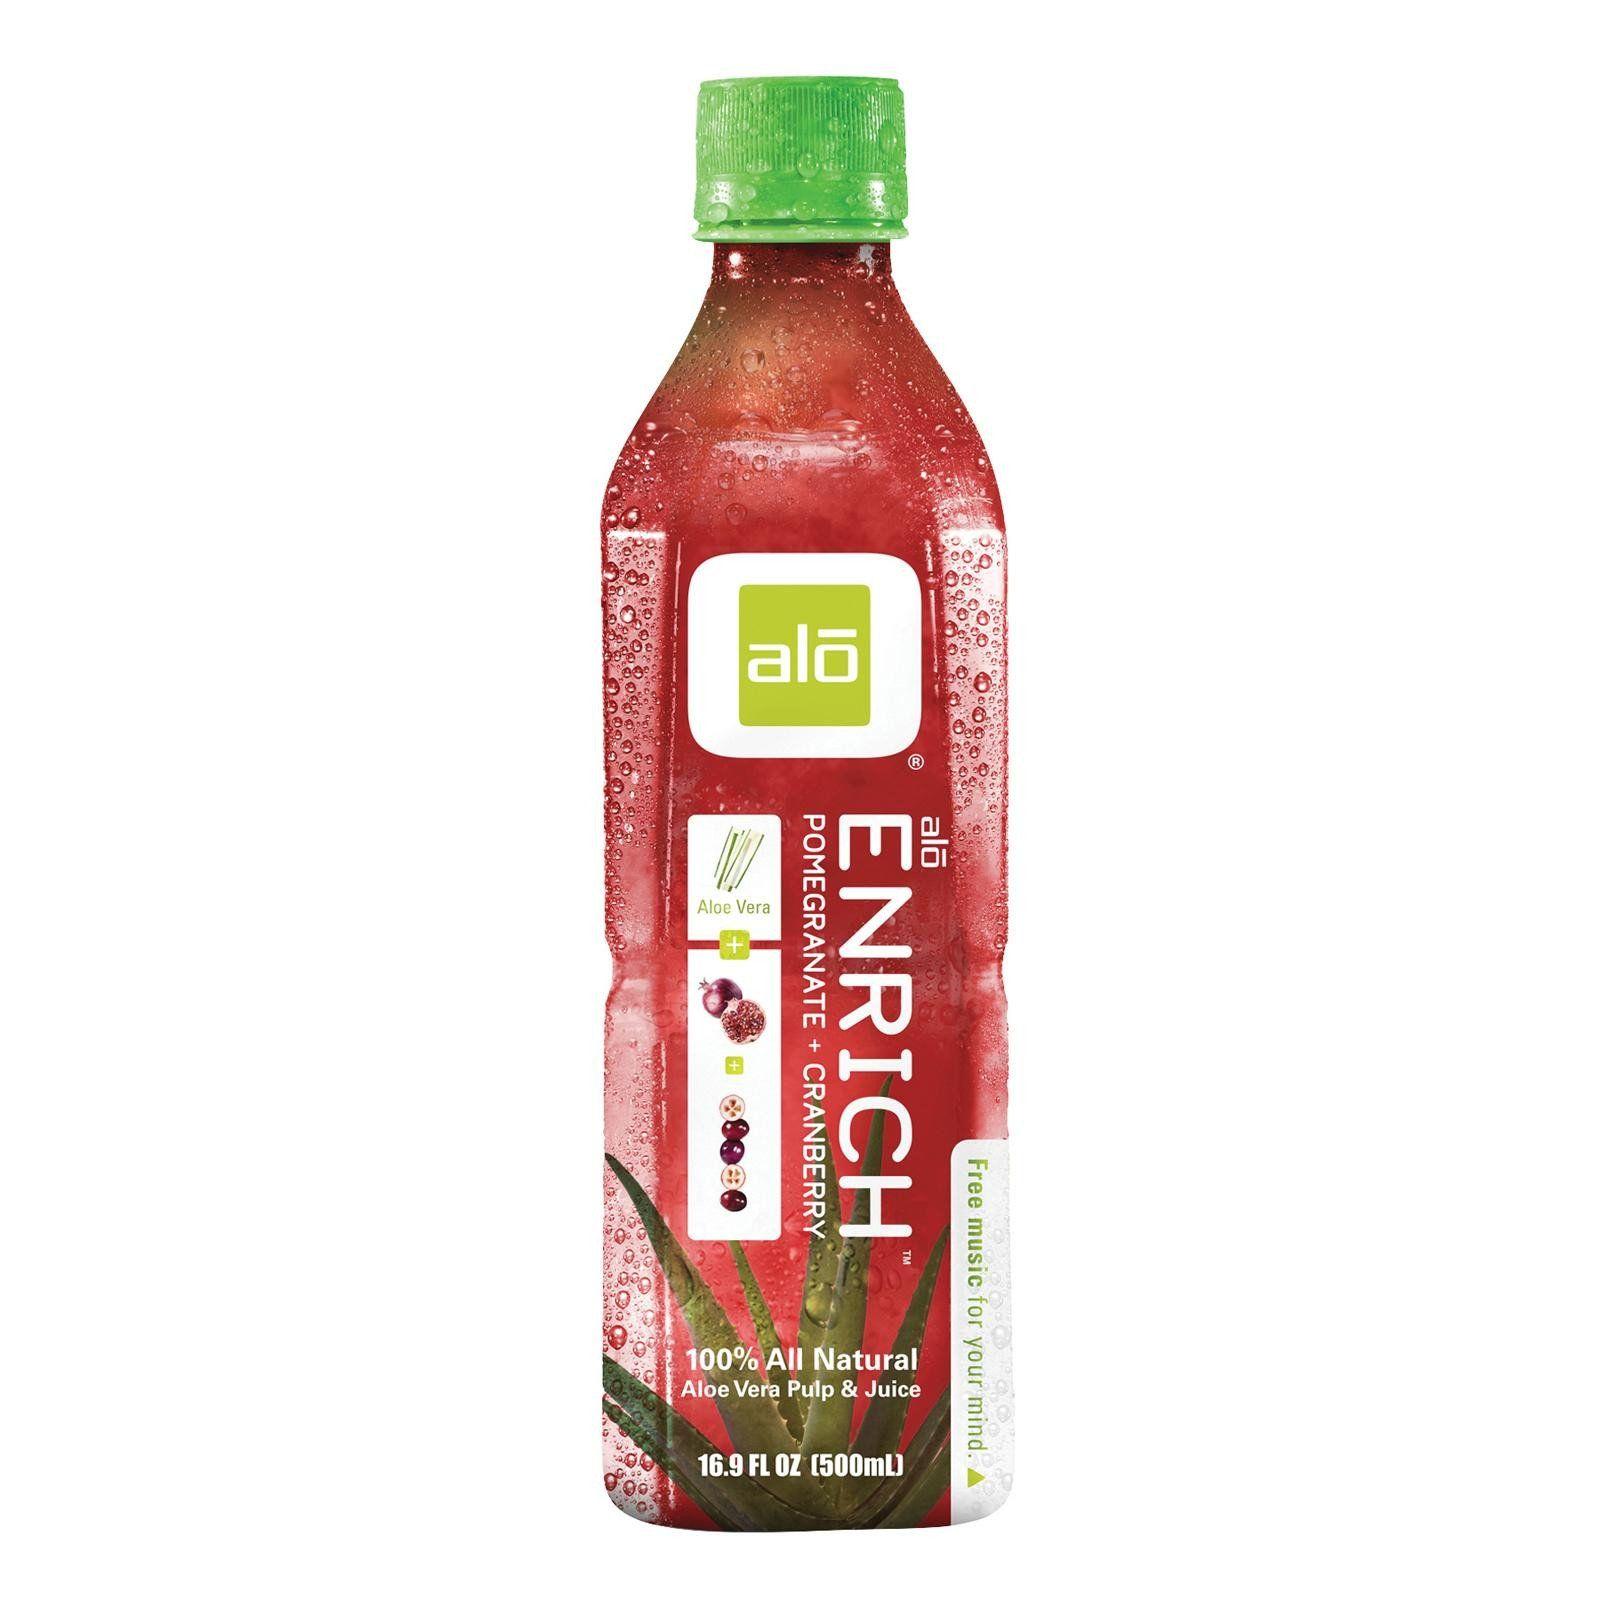 Alo Original Enrich Aloe Vera Juice Drink Pomegranate